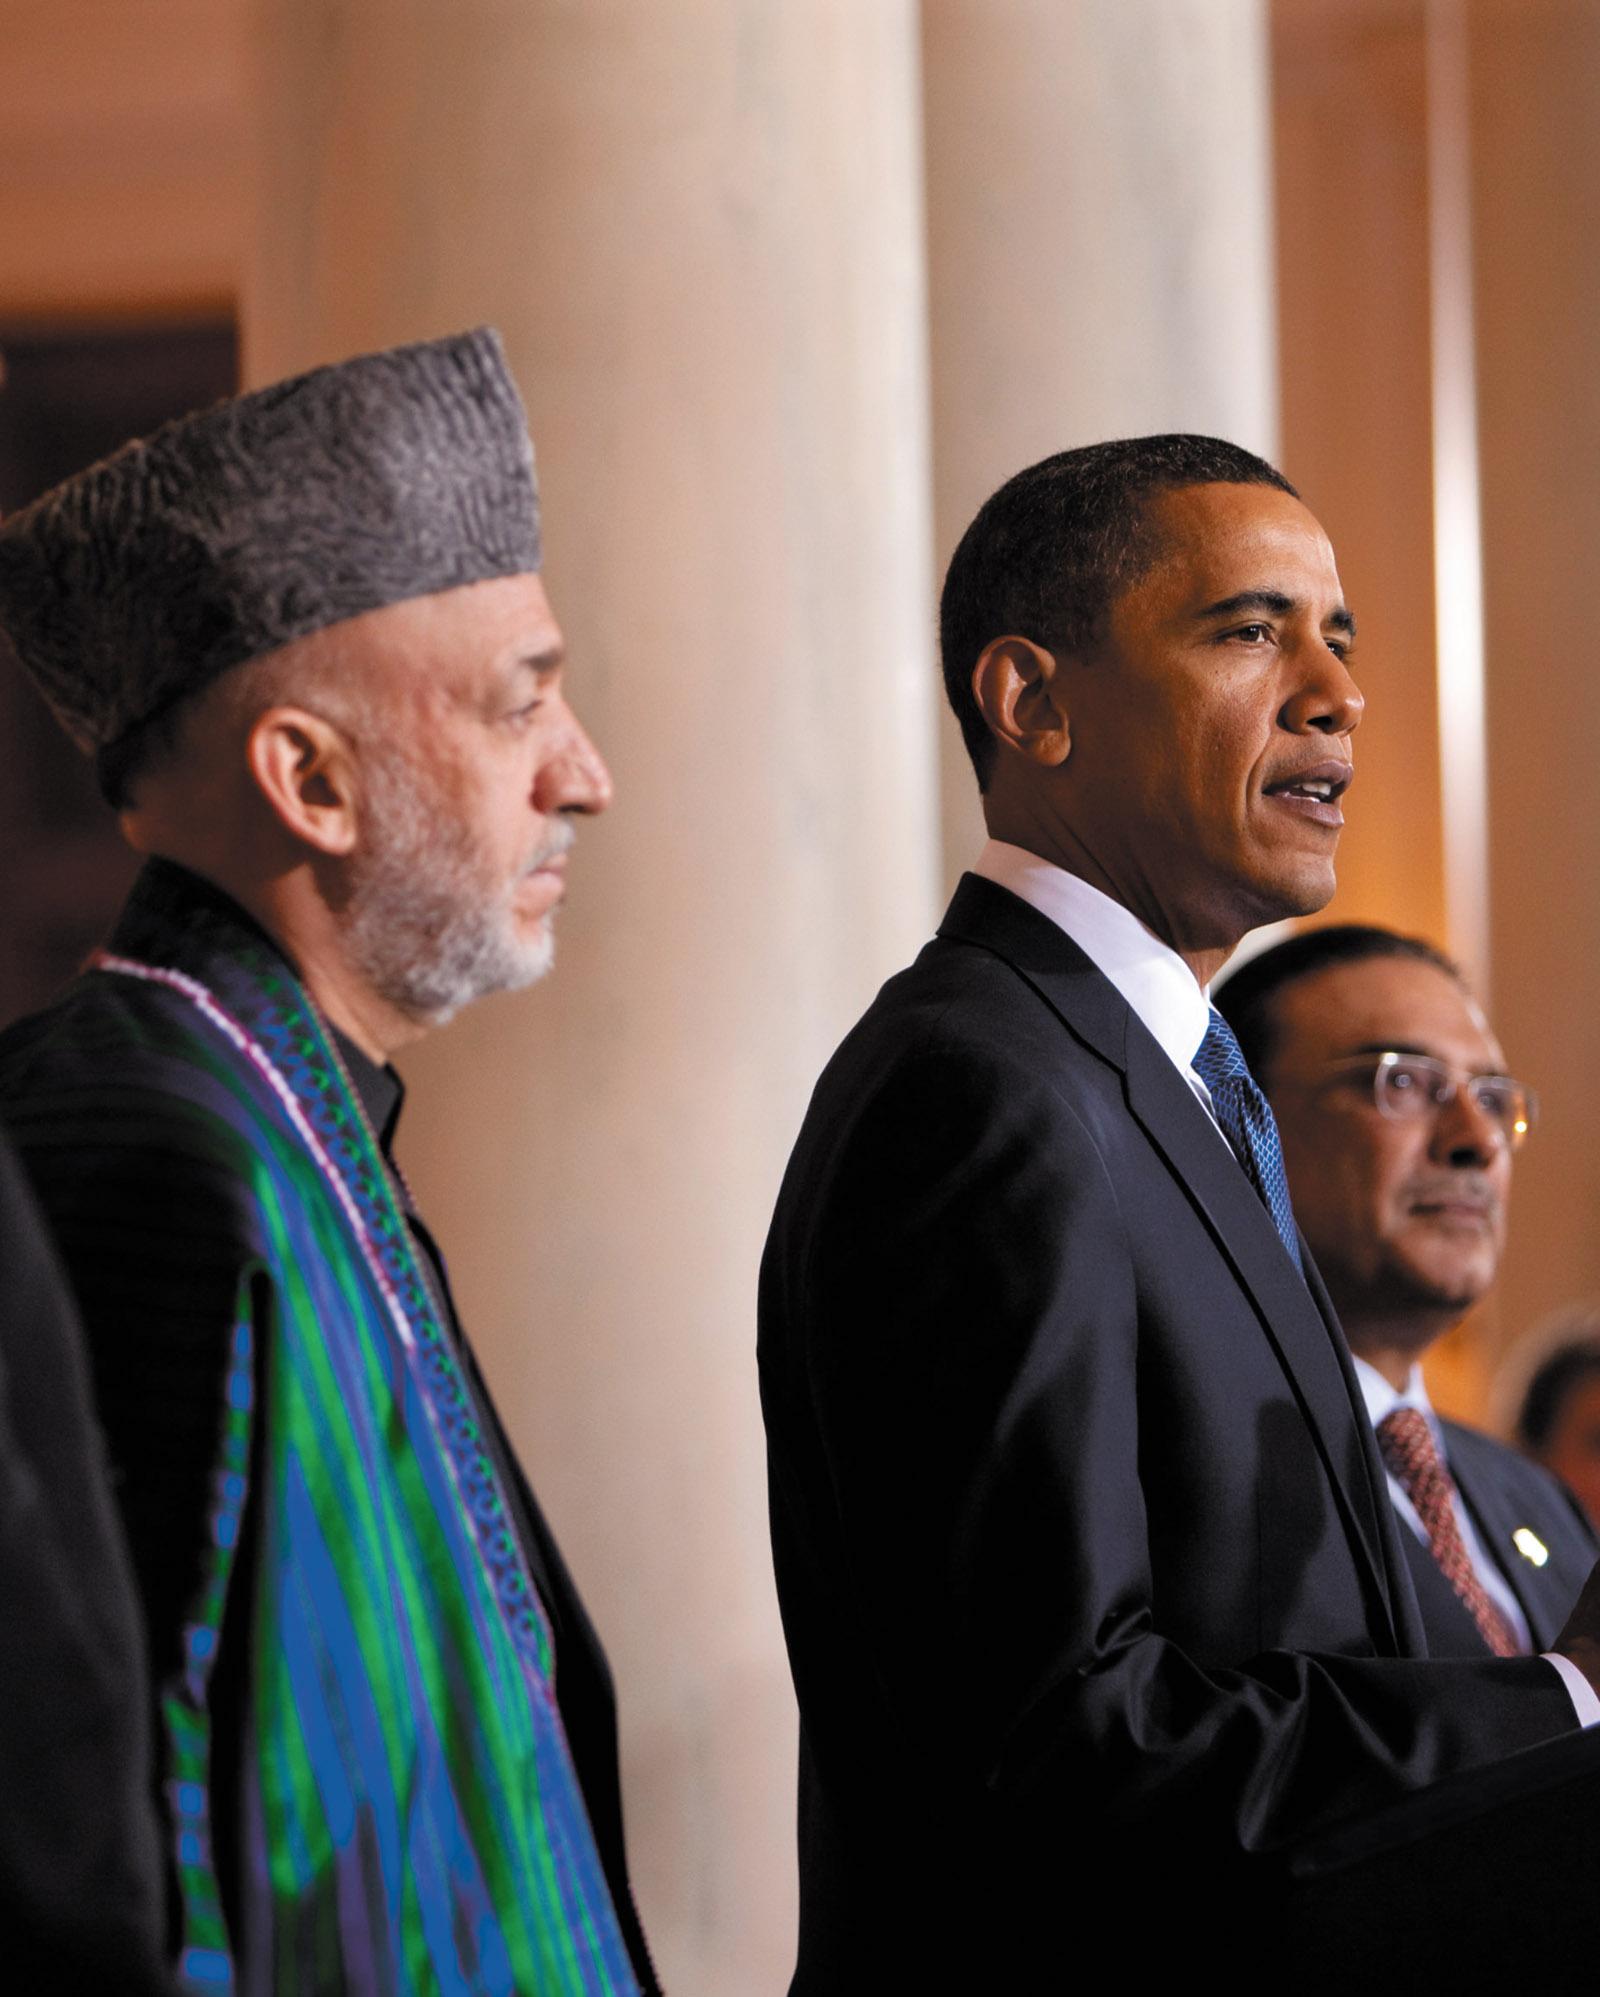 Hamid Karzai and Barack Obama at the White House, May 2009